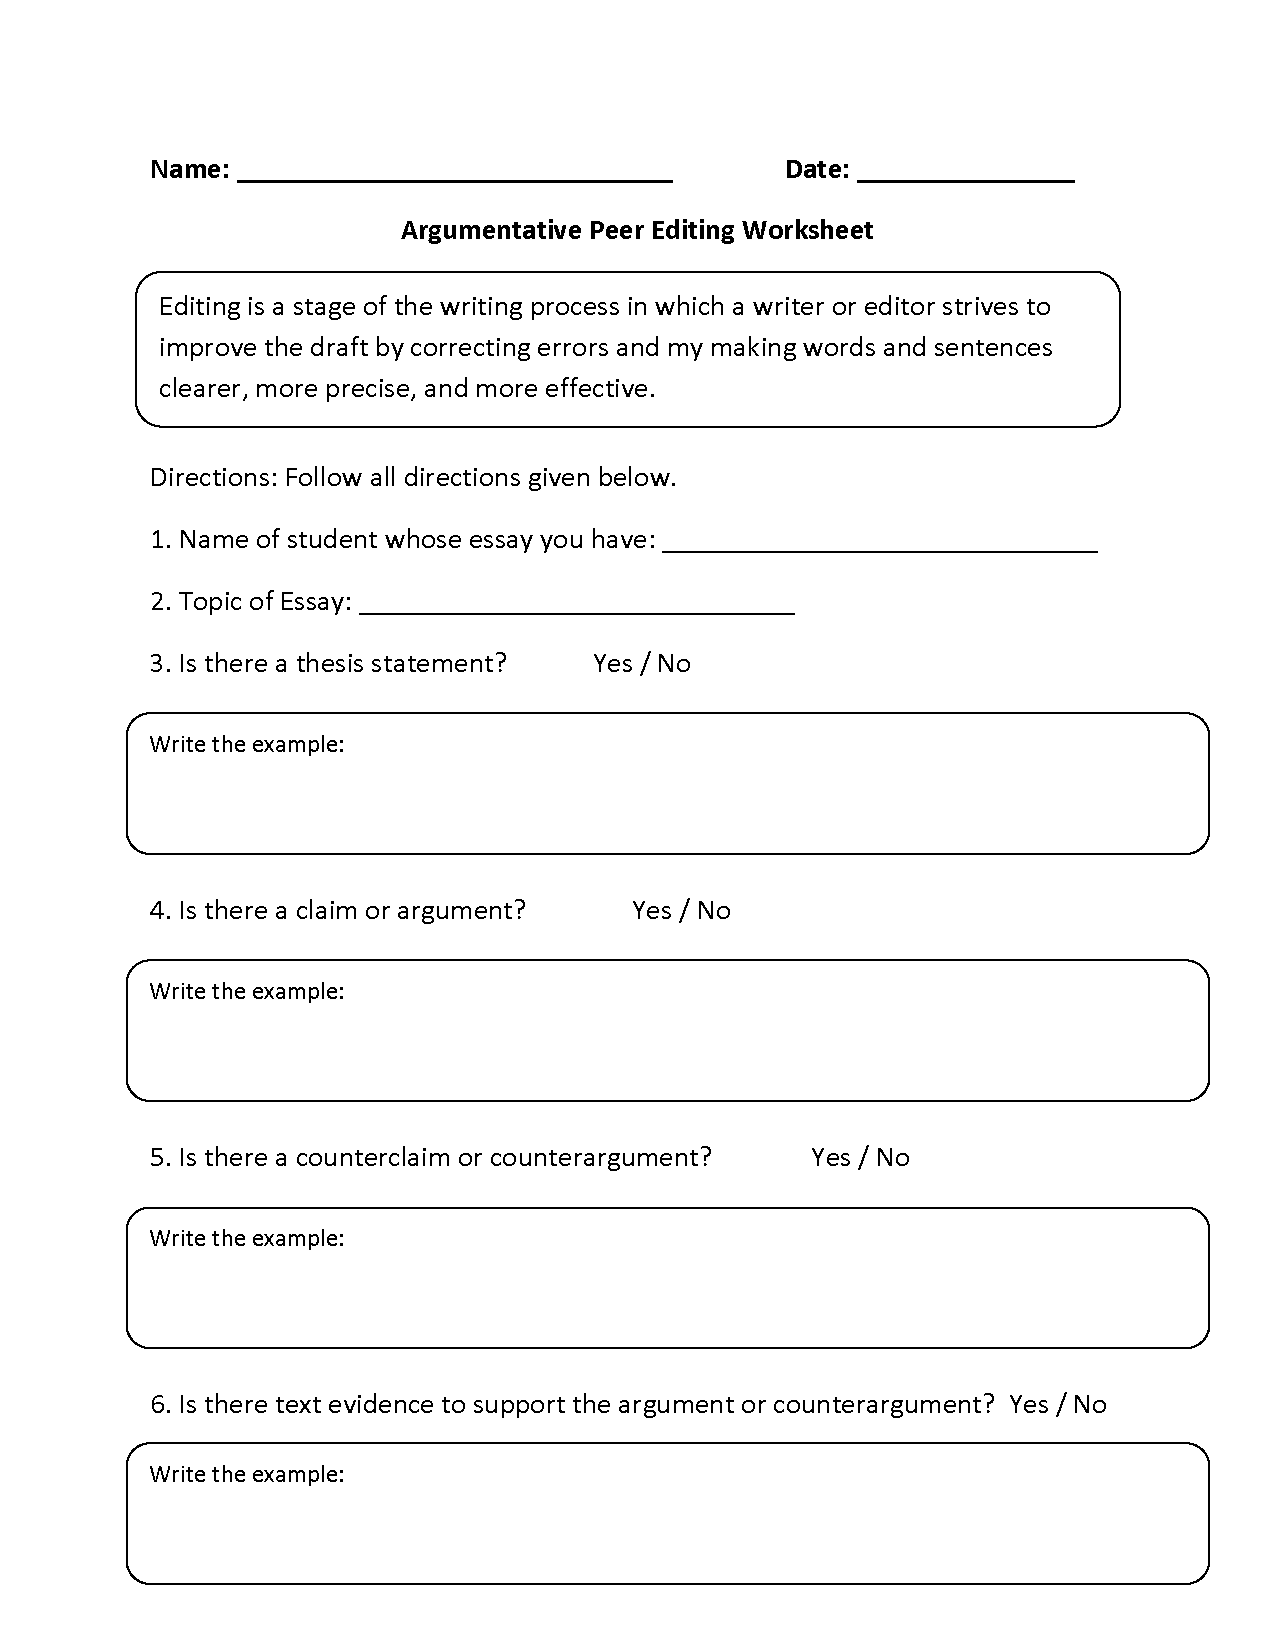 Hamlet essay on death